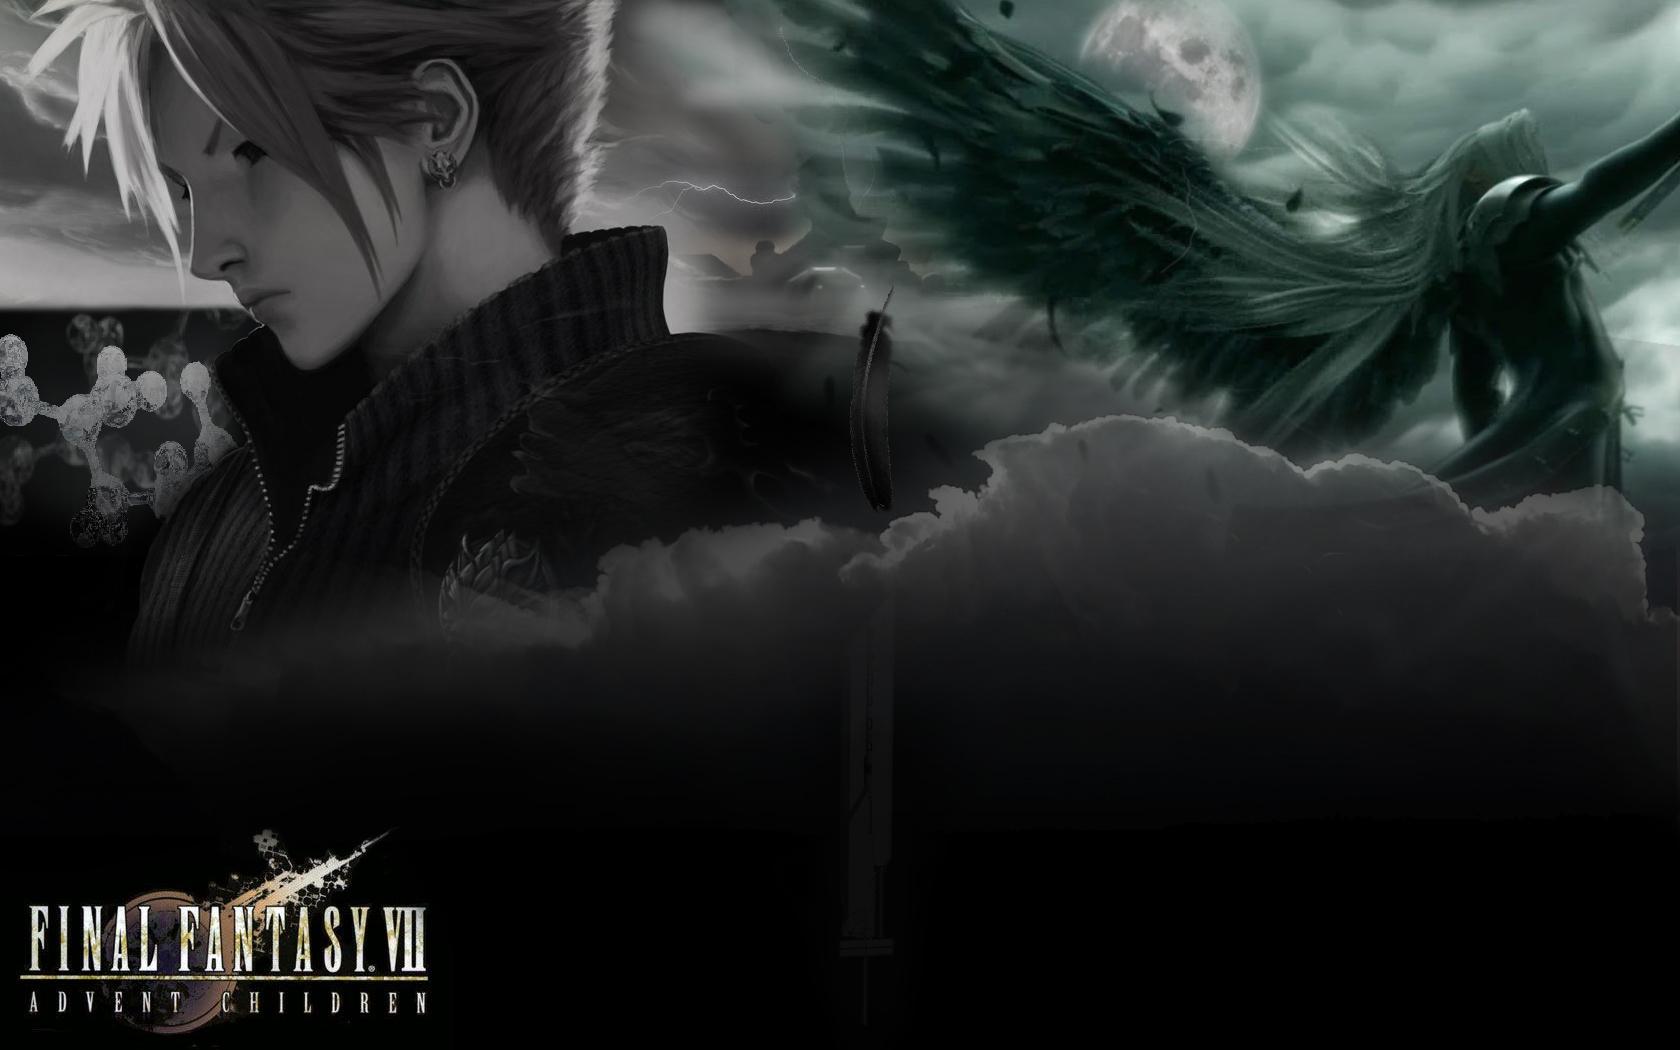 FF7 Background